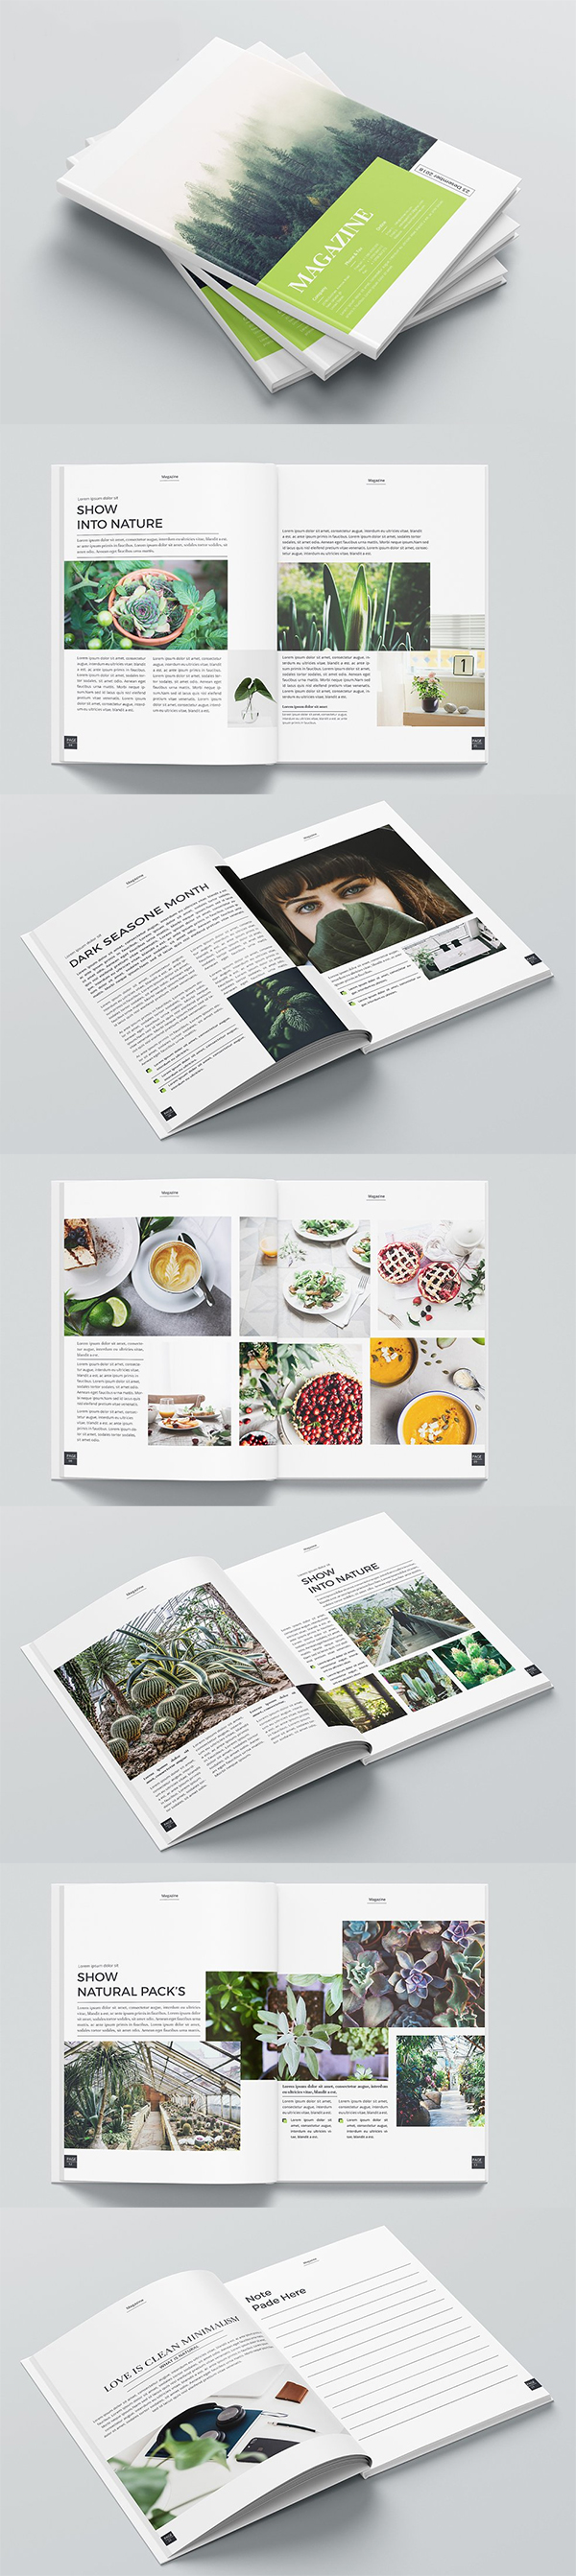 Botanic Natural Magazine